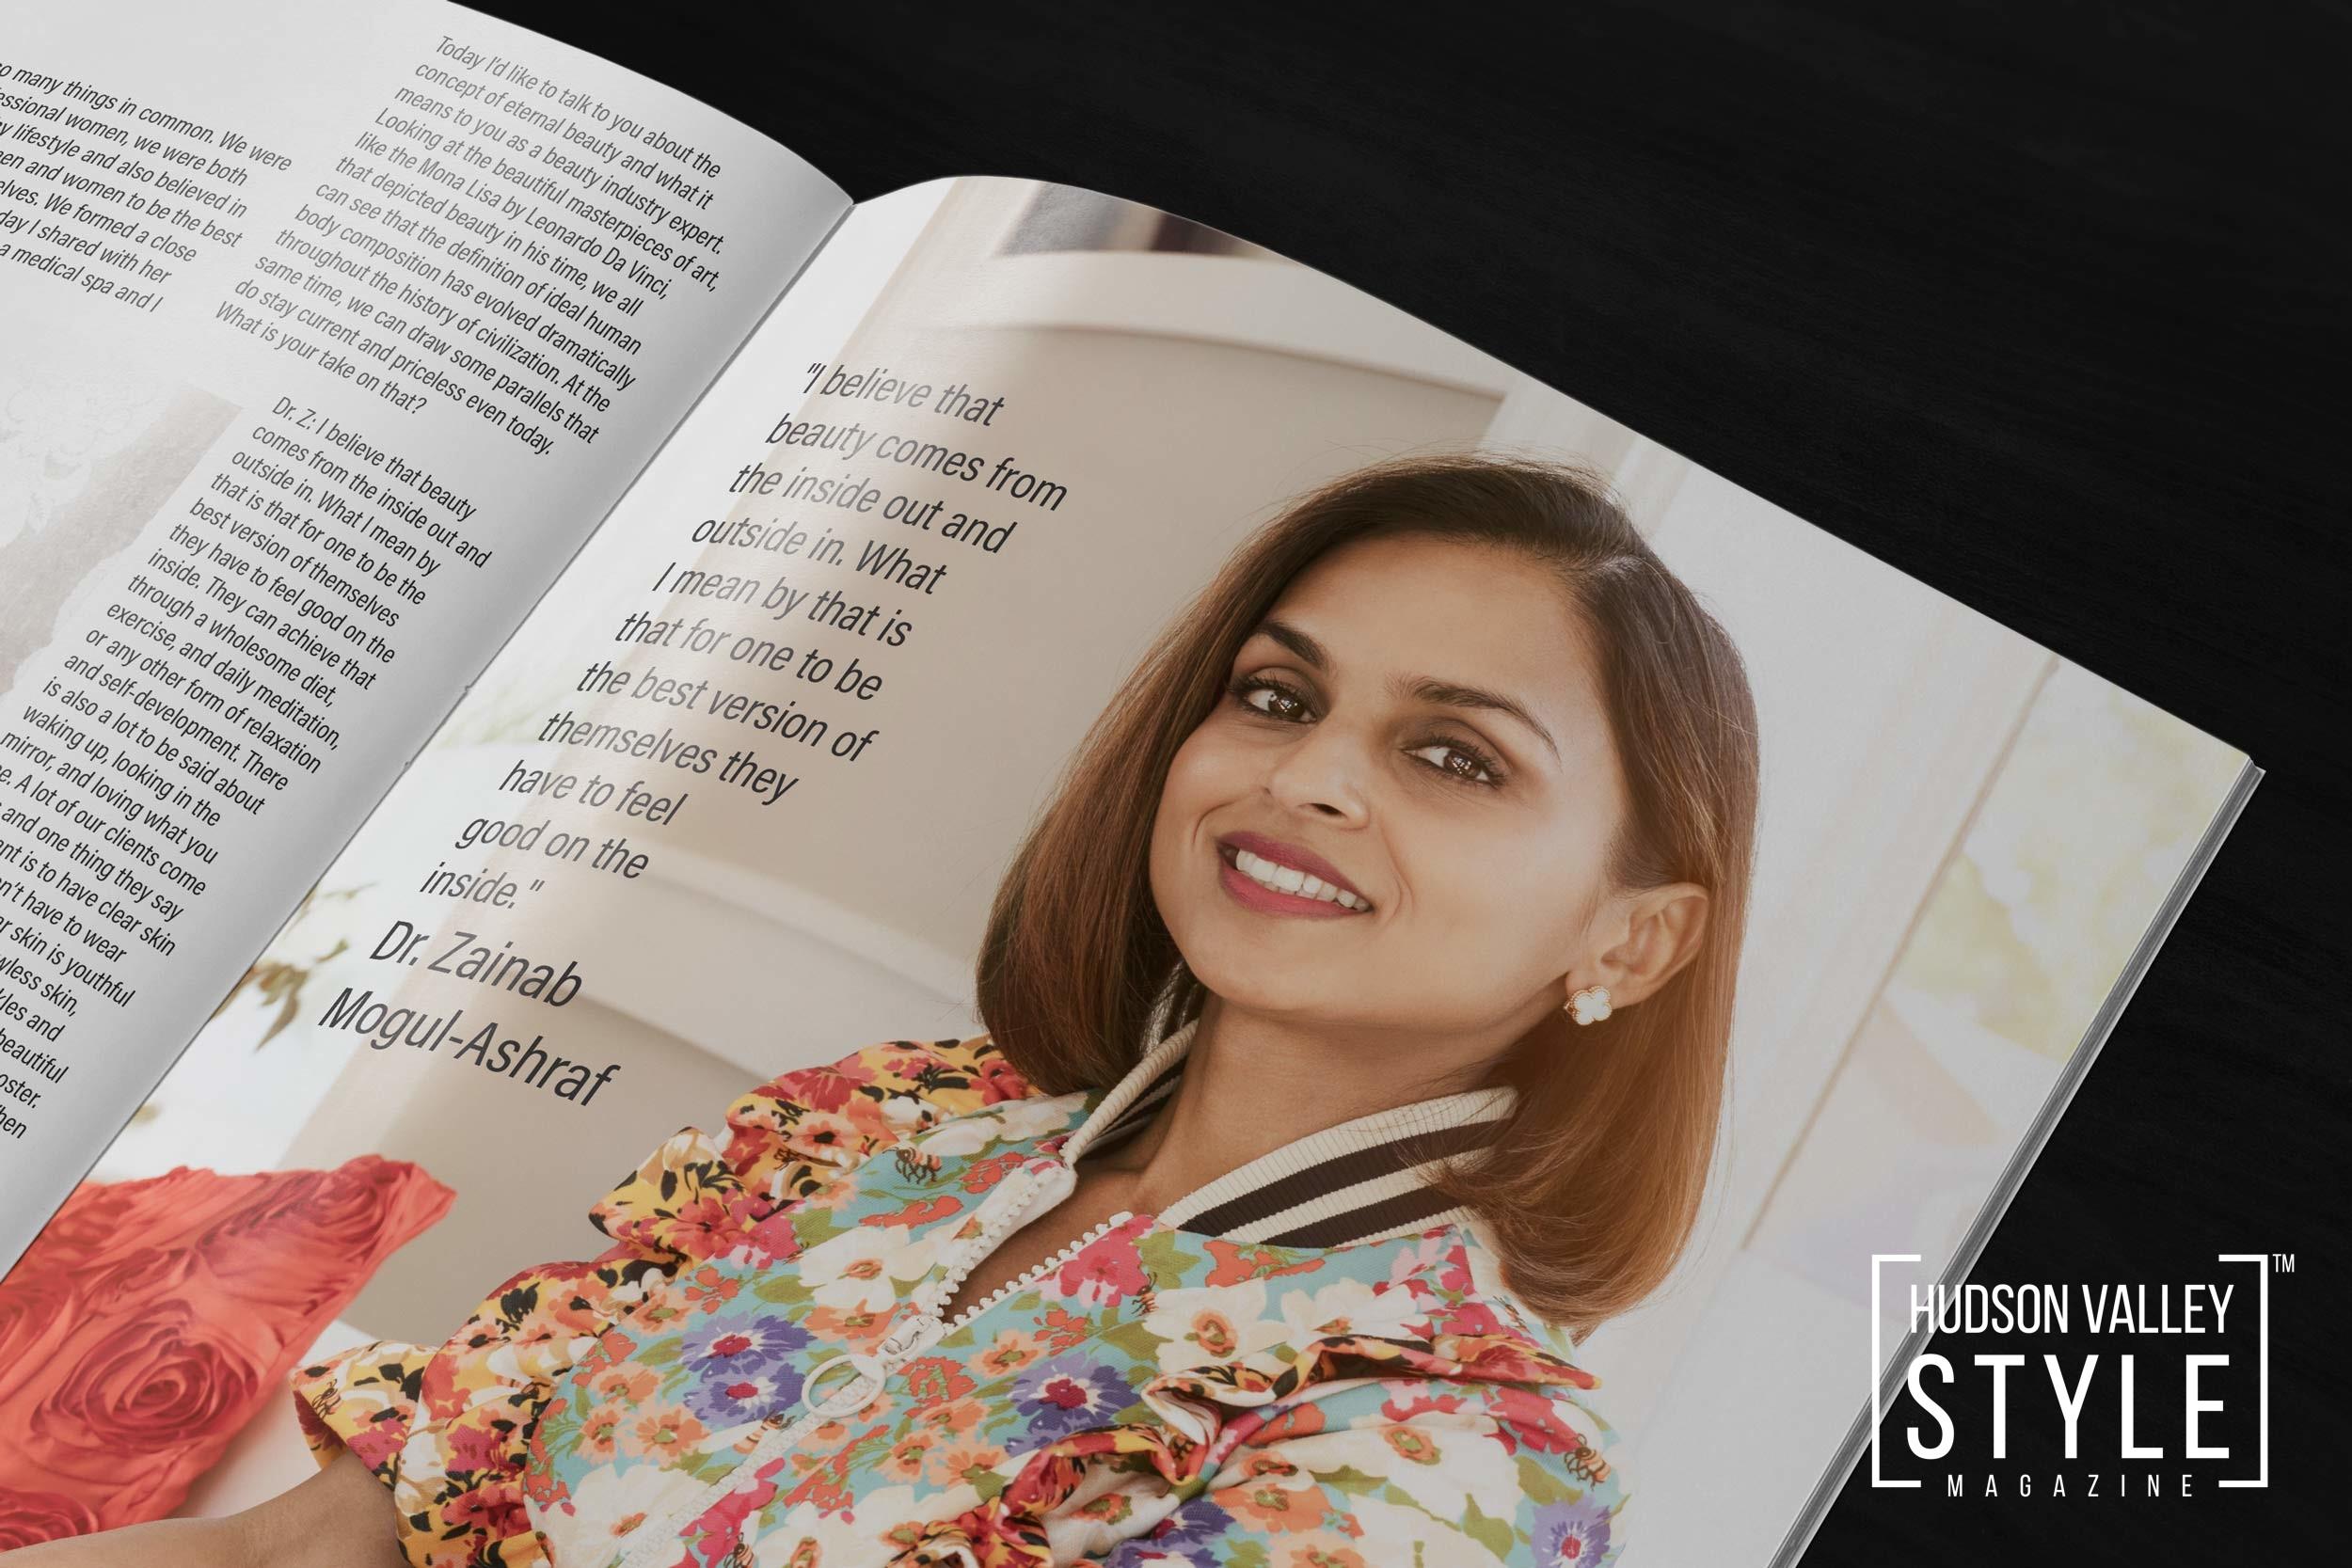 Hudson Valley Style Magazine - Fall 2020 - Dr Zainab Mogul-Ashraf